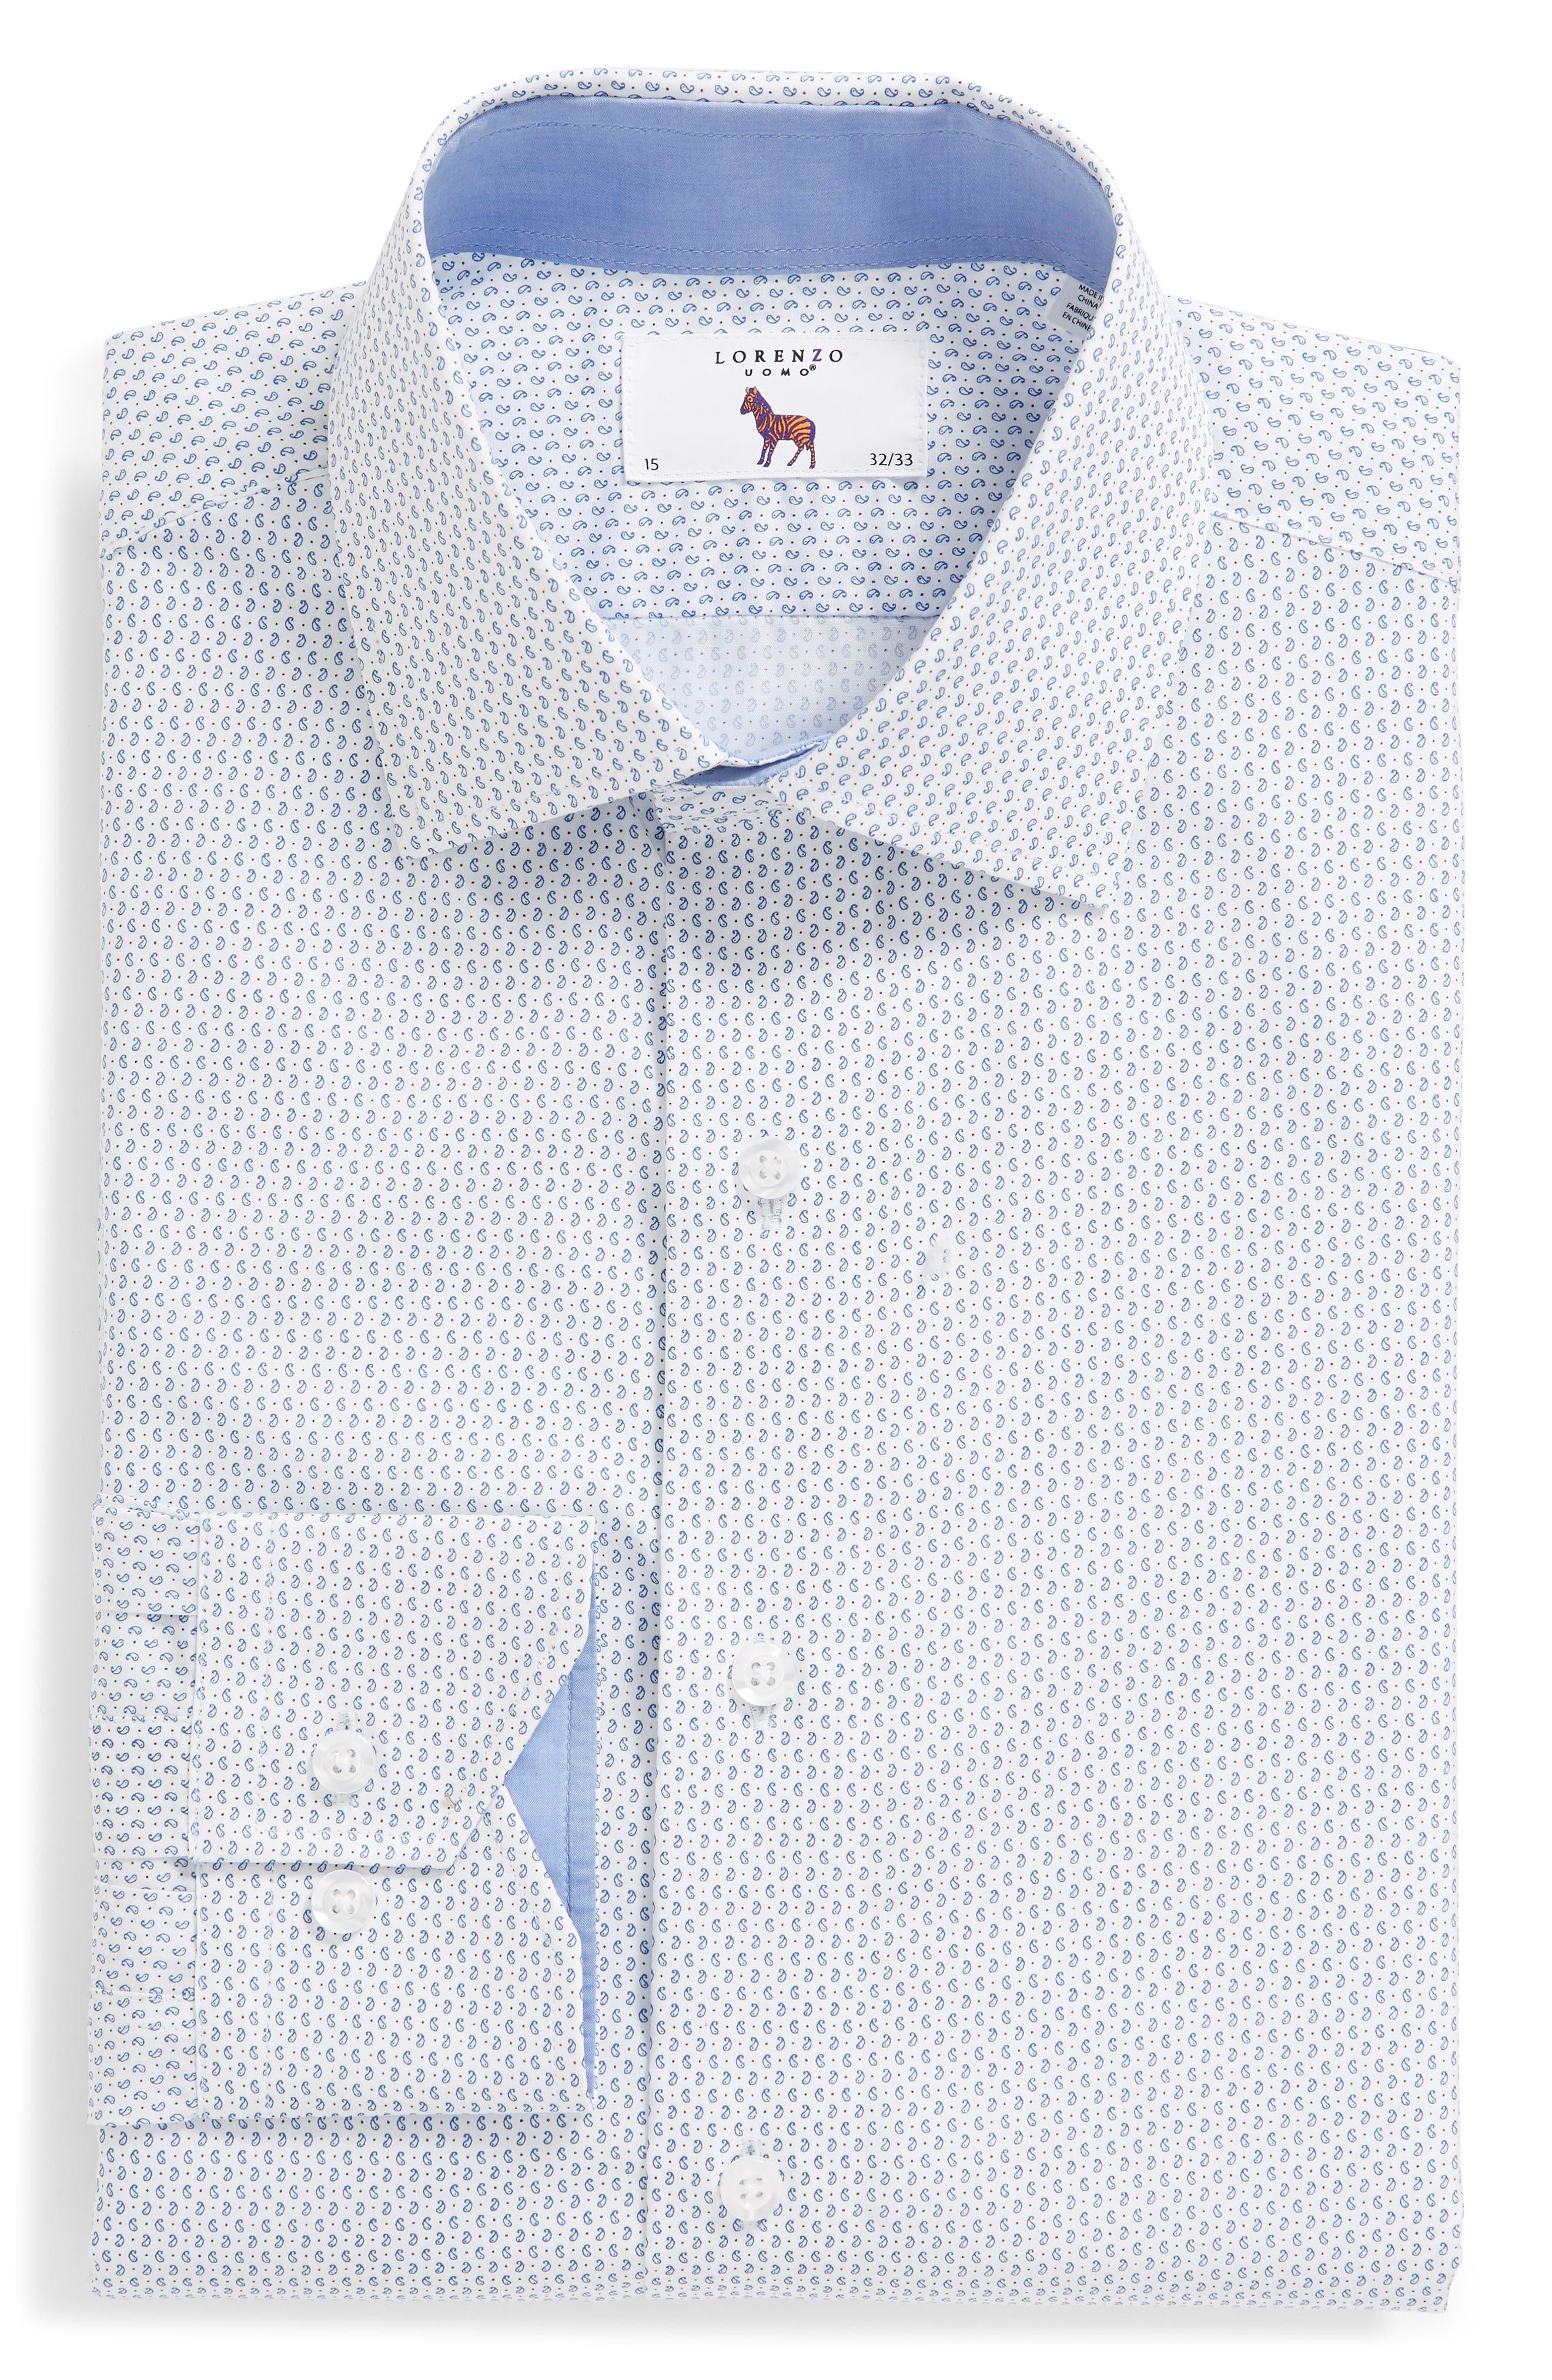 Trim Fit Paisley Dress Shirt,                             Alternate thumbnail 6, color,                             White/ Blue